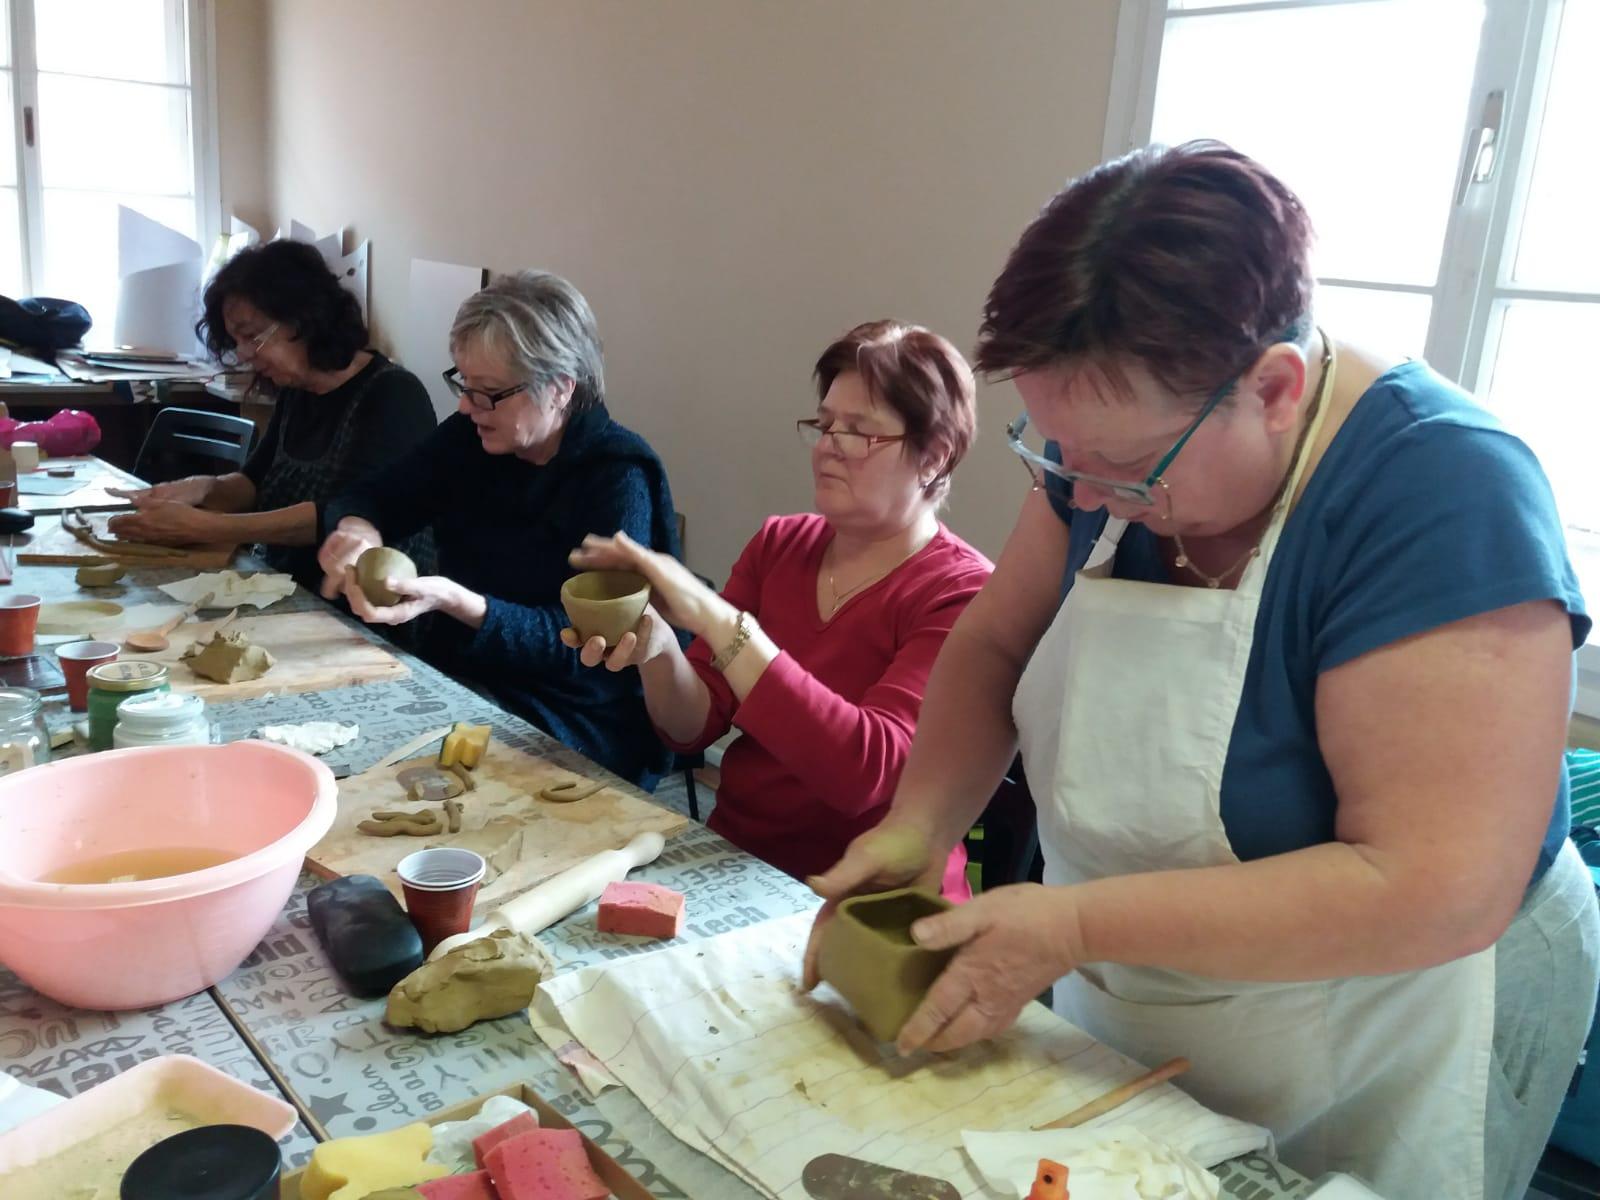 Radionica oblikovanja keramike